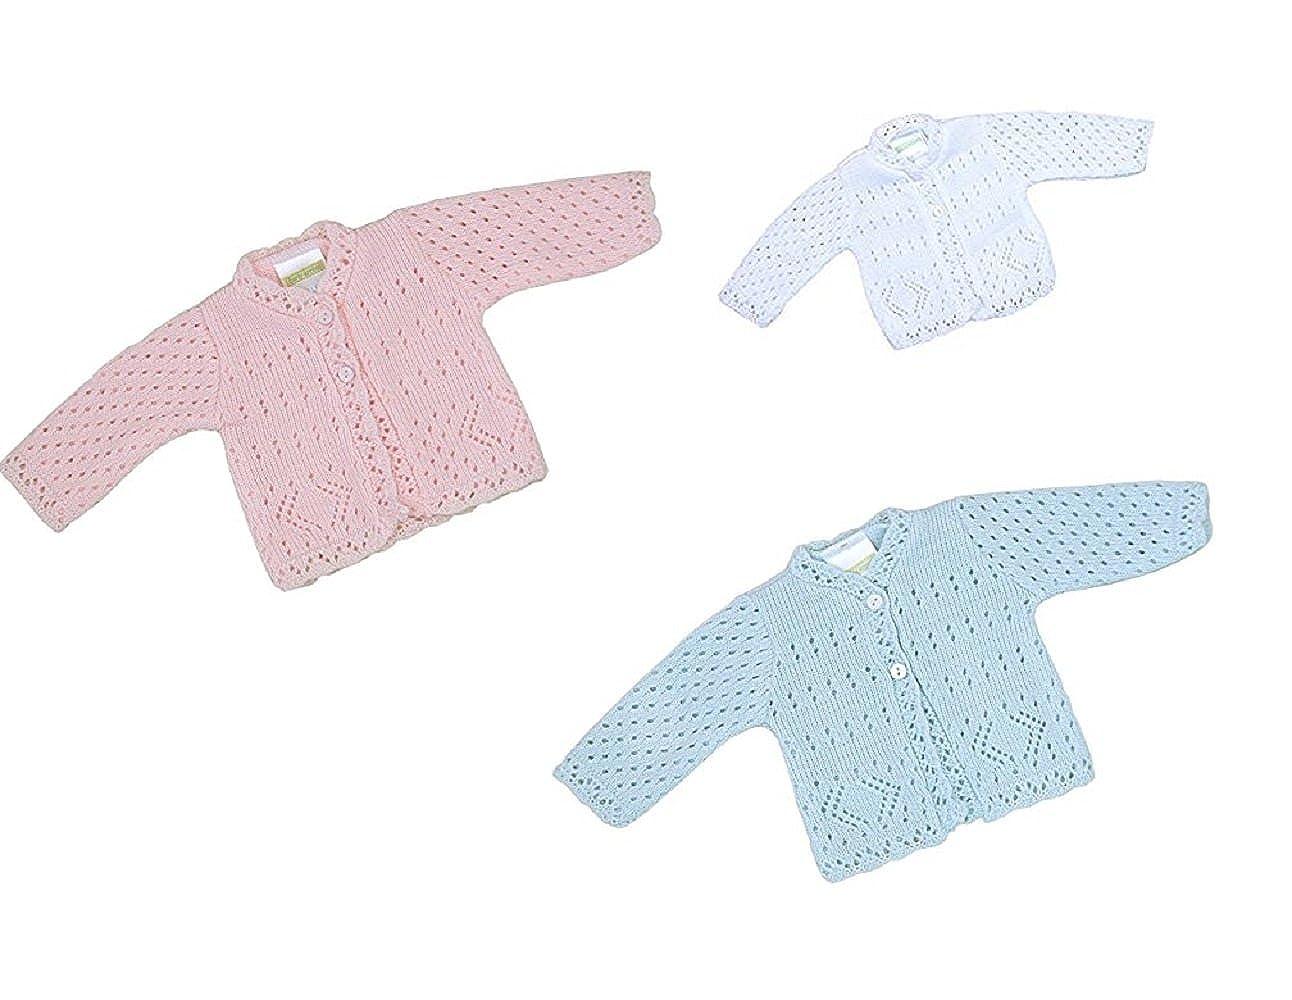 Premature Babies Cardigan Jumber Jacket Tiny Small Girls Boys 3-5 lbs 5-8 lbs